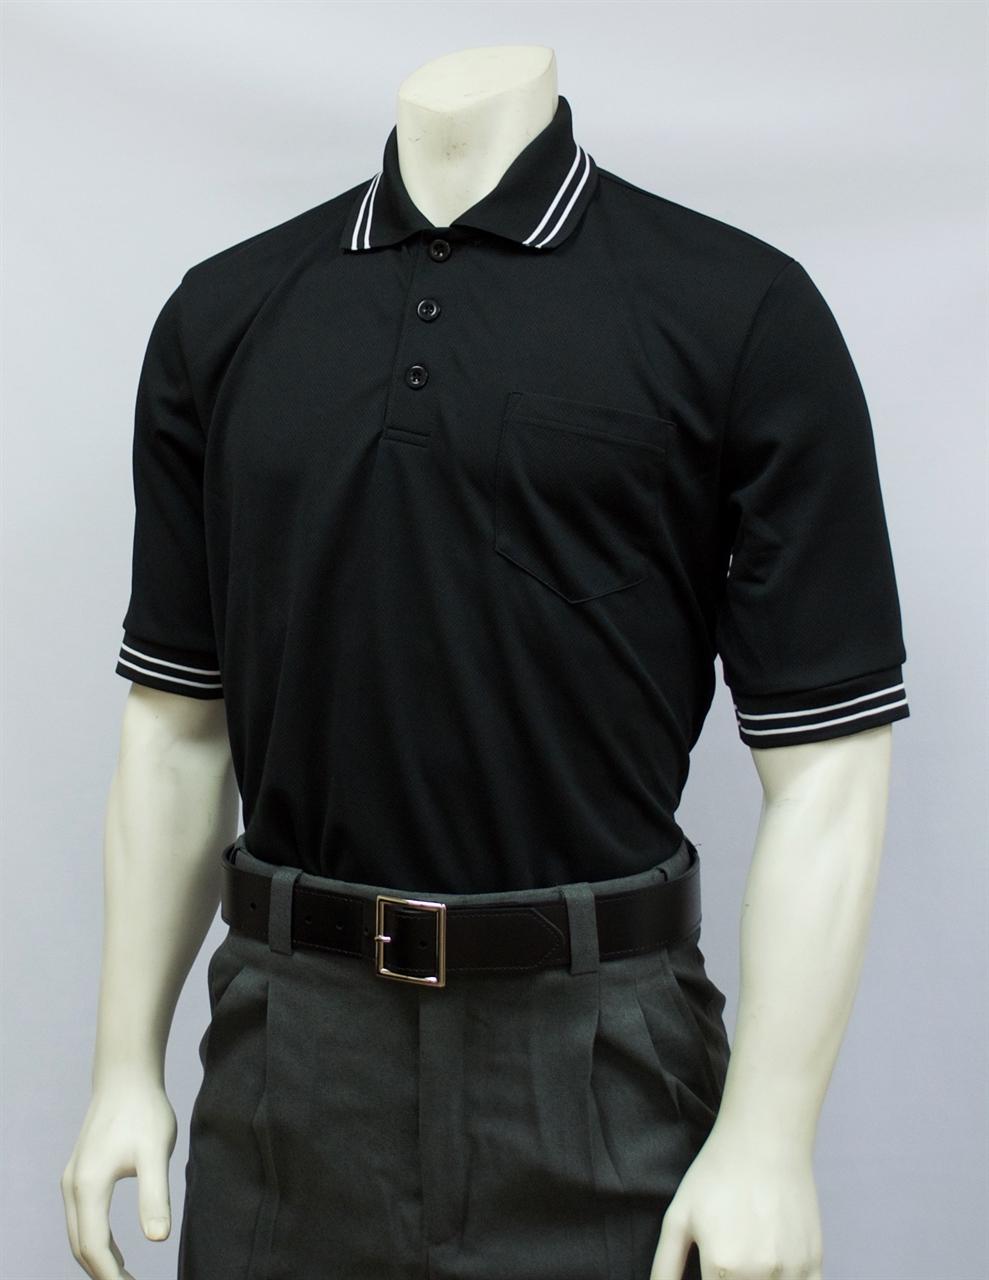 db4ca6903de6 Babe Ruth League Online Store. Smitty Traditional Umpire Shirt